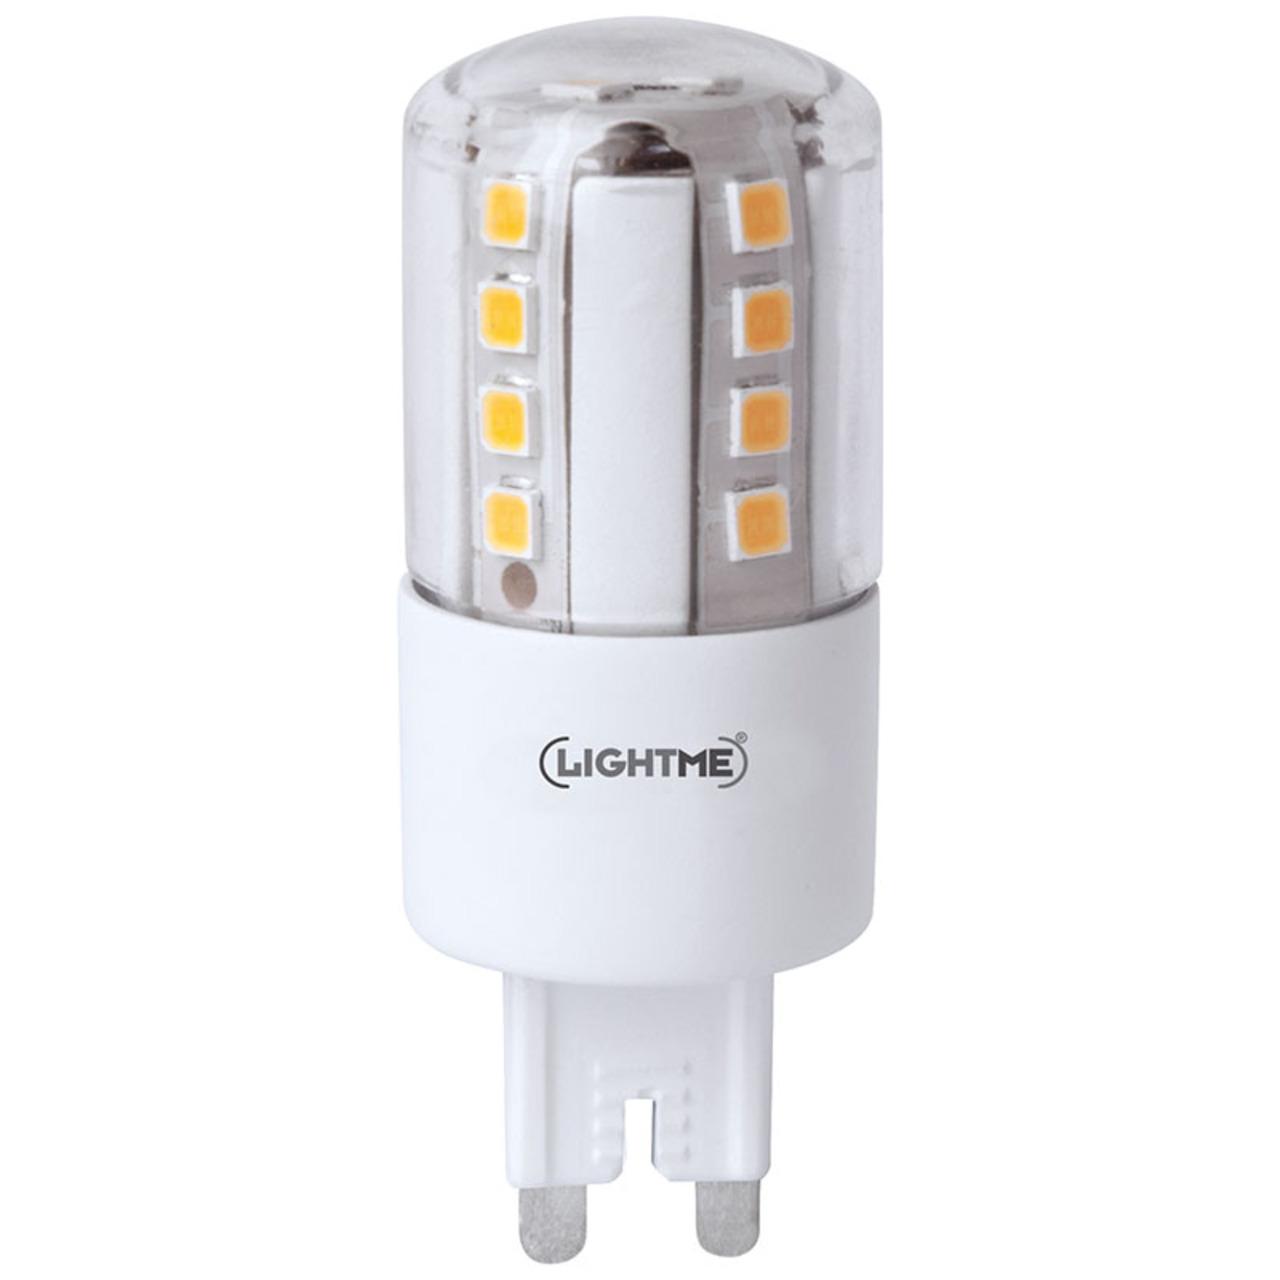 Lightme 4-5-W-G9-LED-Lampe- warmweiund-223 - dimmbar- 510 lm